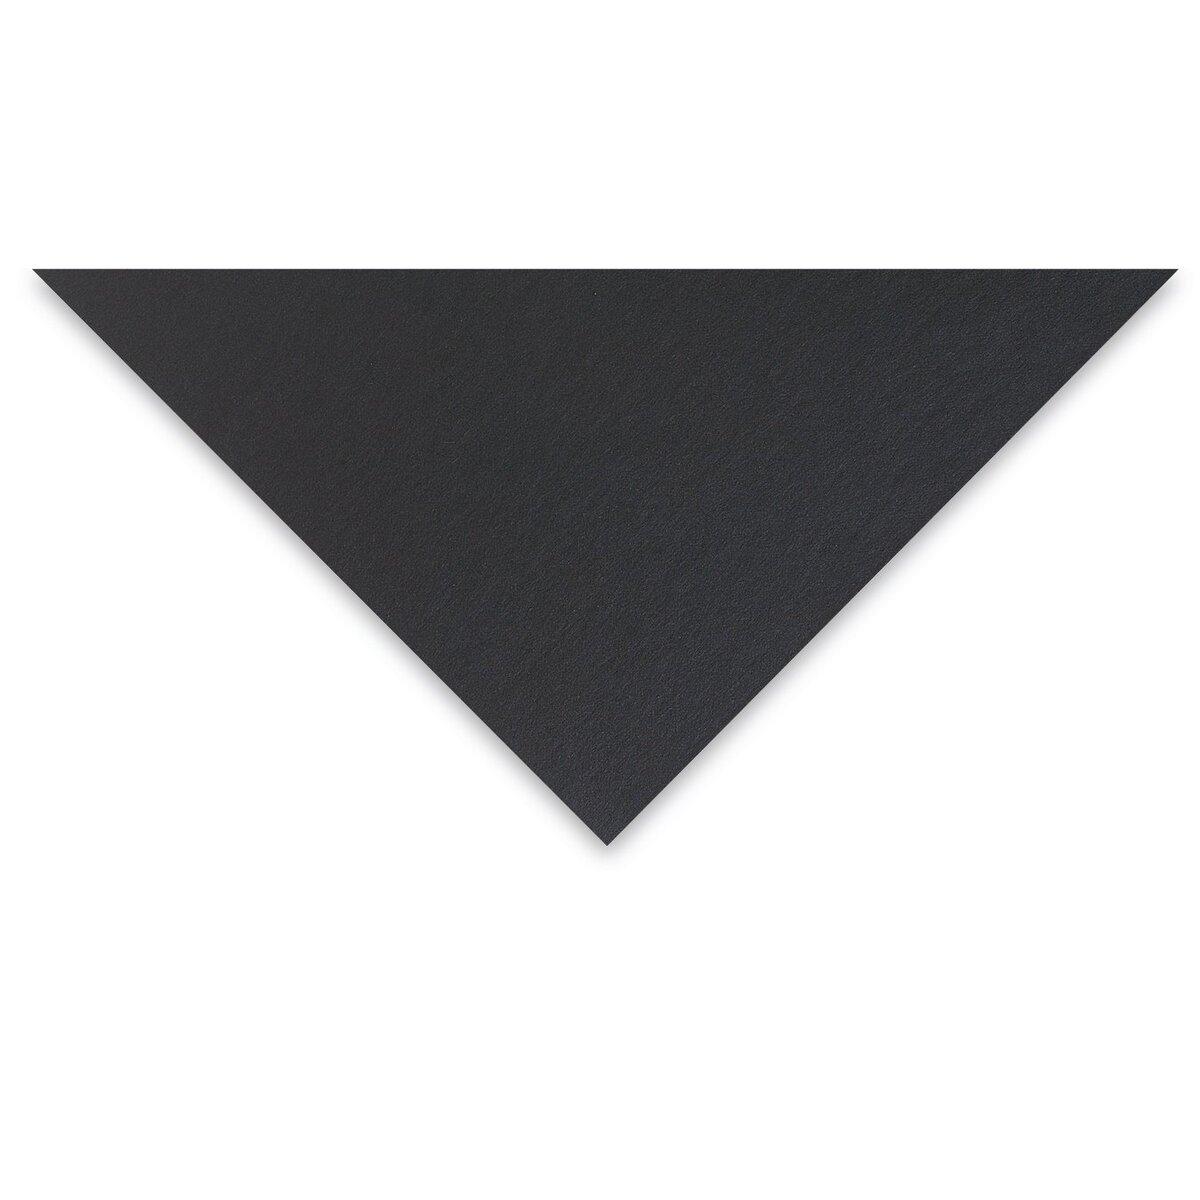 Crescent Mounting Board - 32 x 40 x .055, Ultra Black